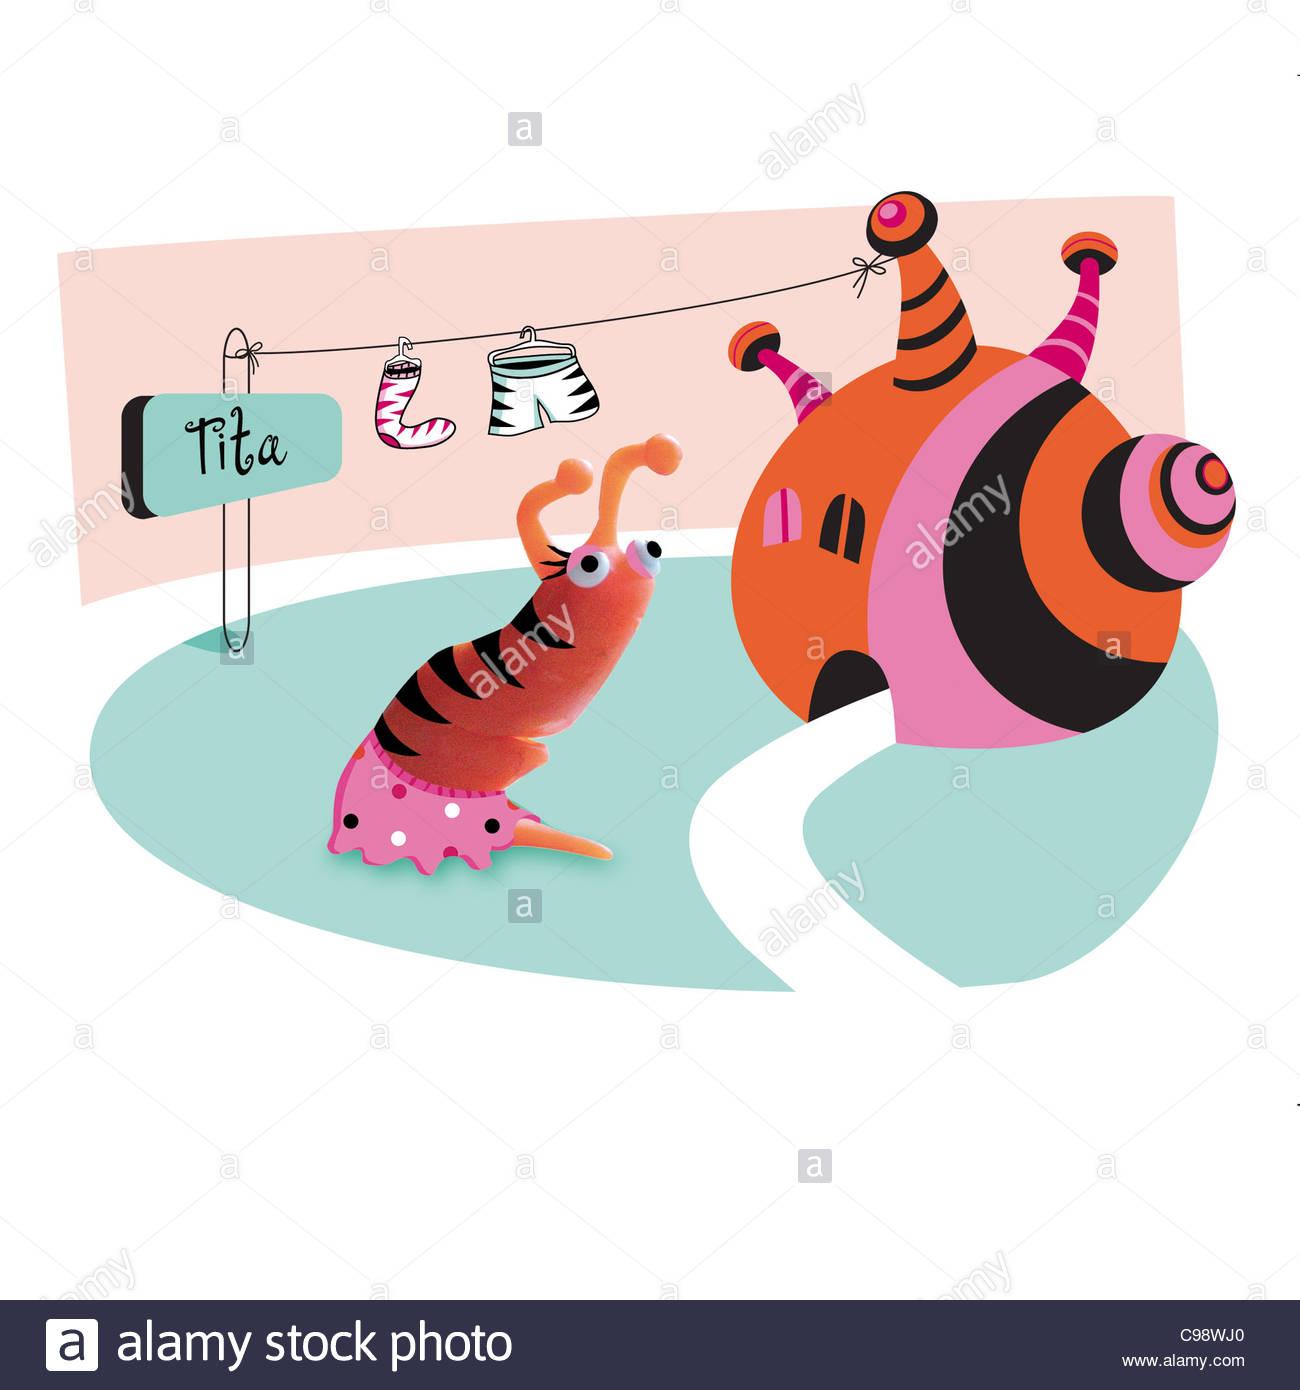 childrens book illustration stock photos u0026 childrens book